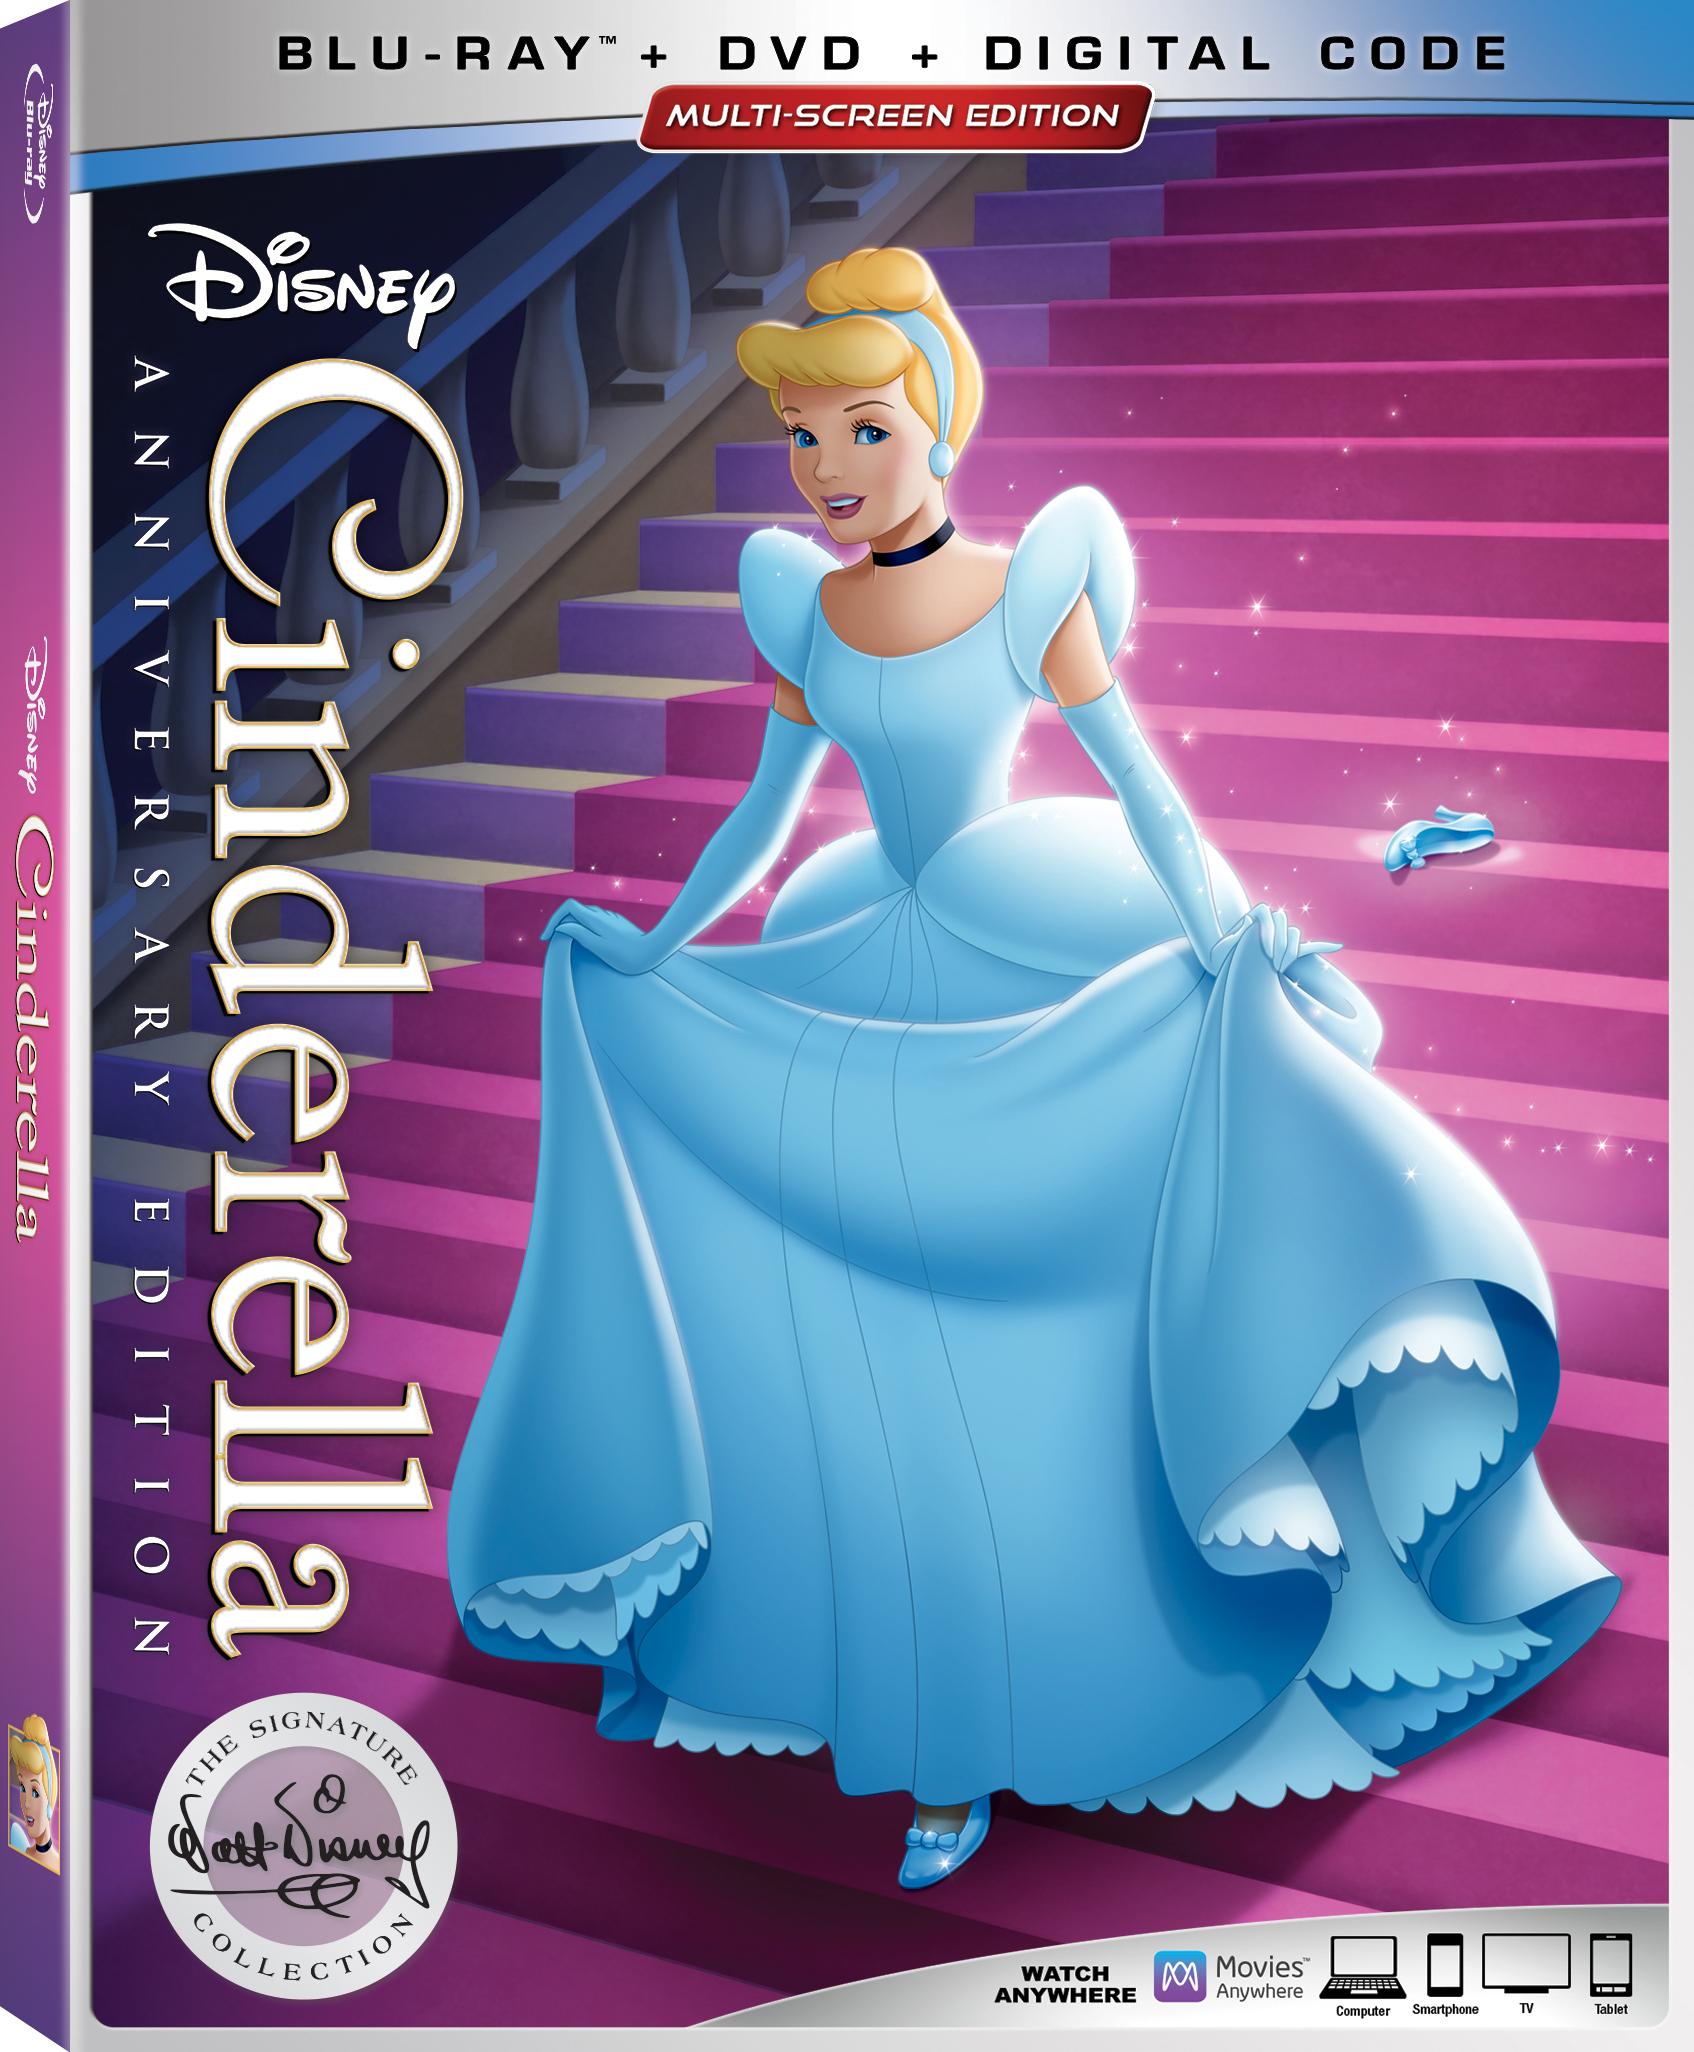 Cinderella Walt Disney Signature Collection Arrives On Digital June 18 And Blu-ray June 25